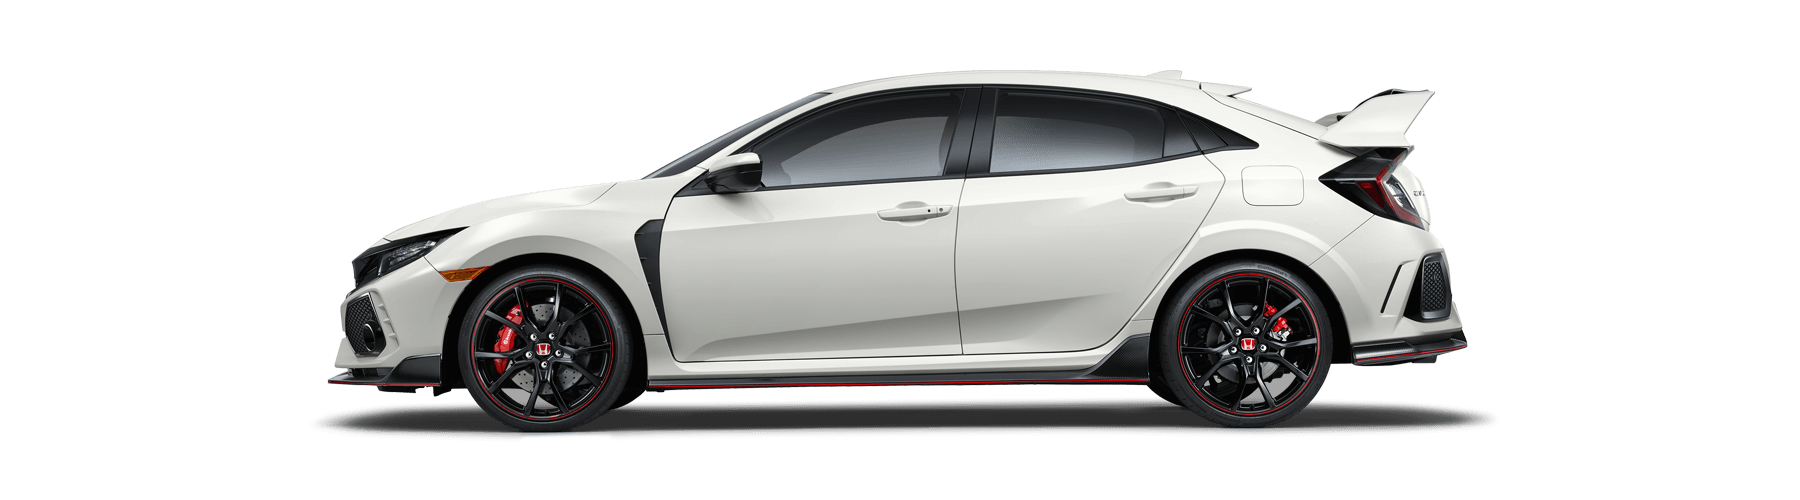 2017 Honda Civic Type R New England Honda Dealers